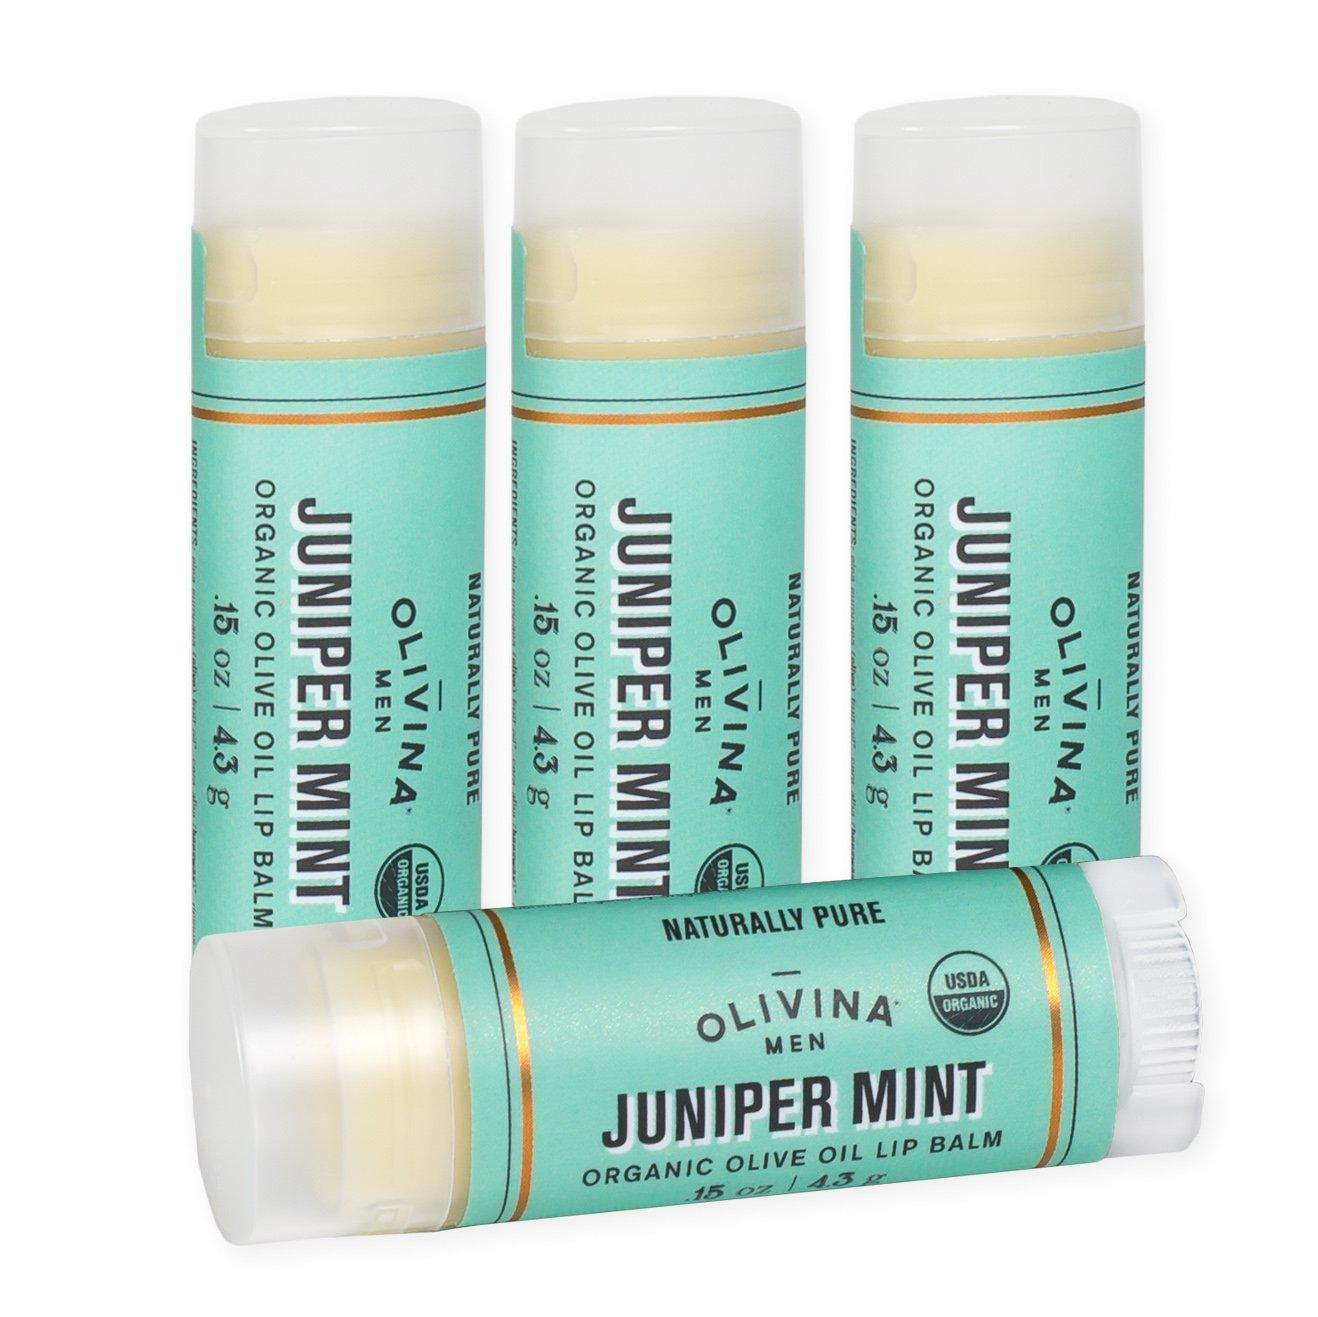 Juniper Mint 0.15 Ounce Moisturizing Olive Oil Lip Balm 4 Pack